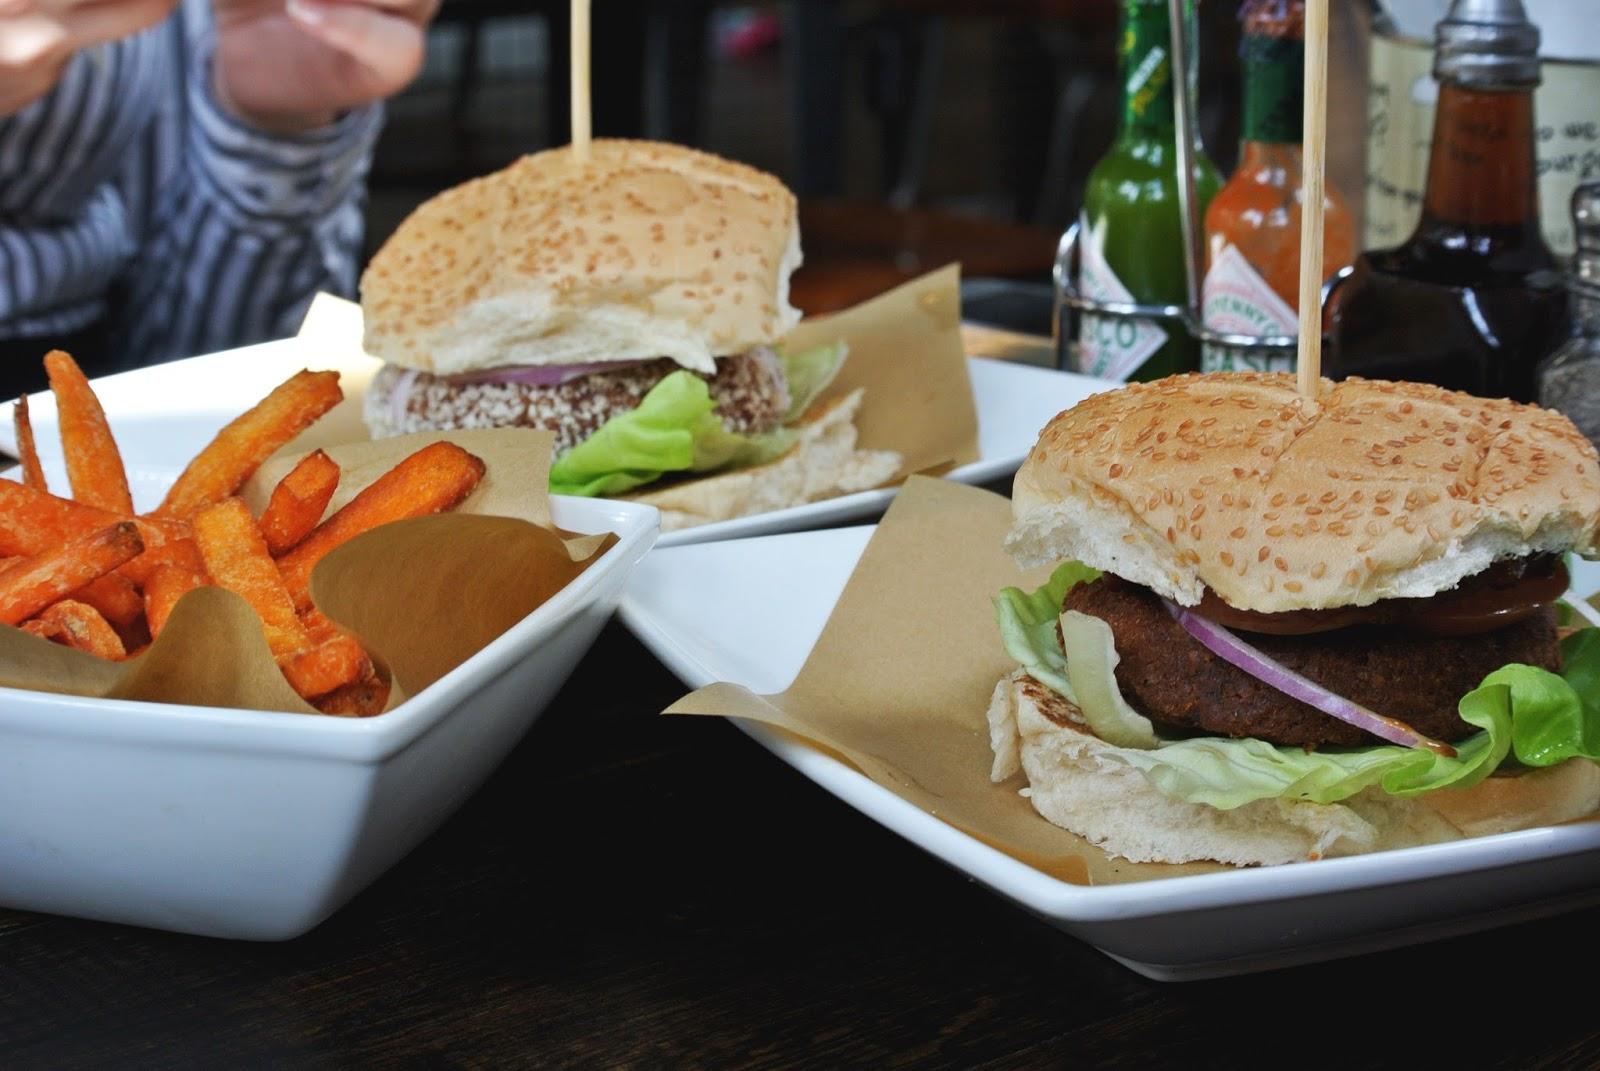 Vegan burgers at Handmade Burger Co